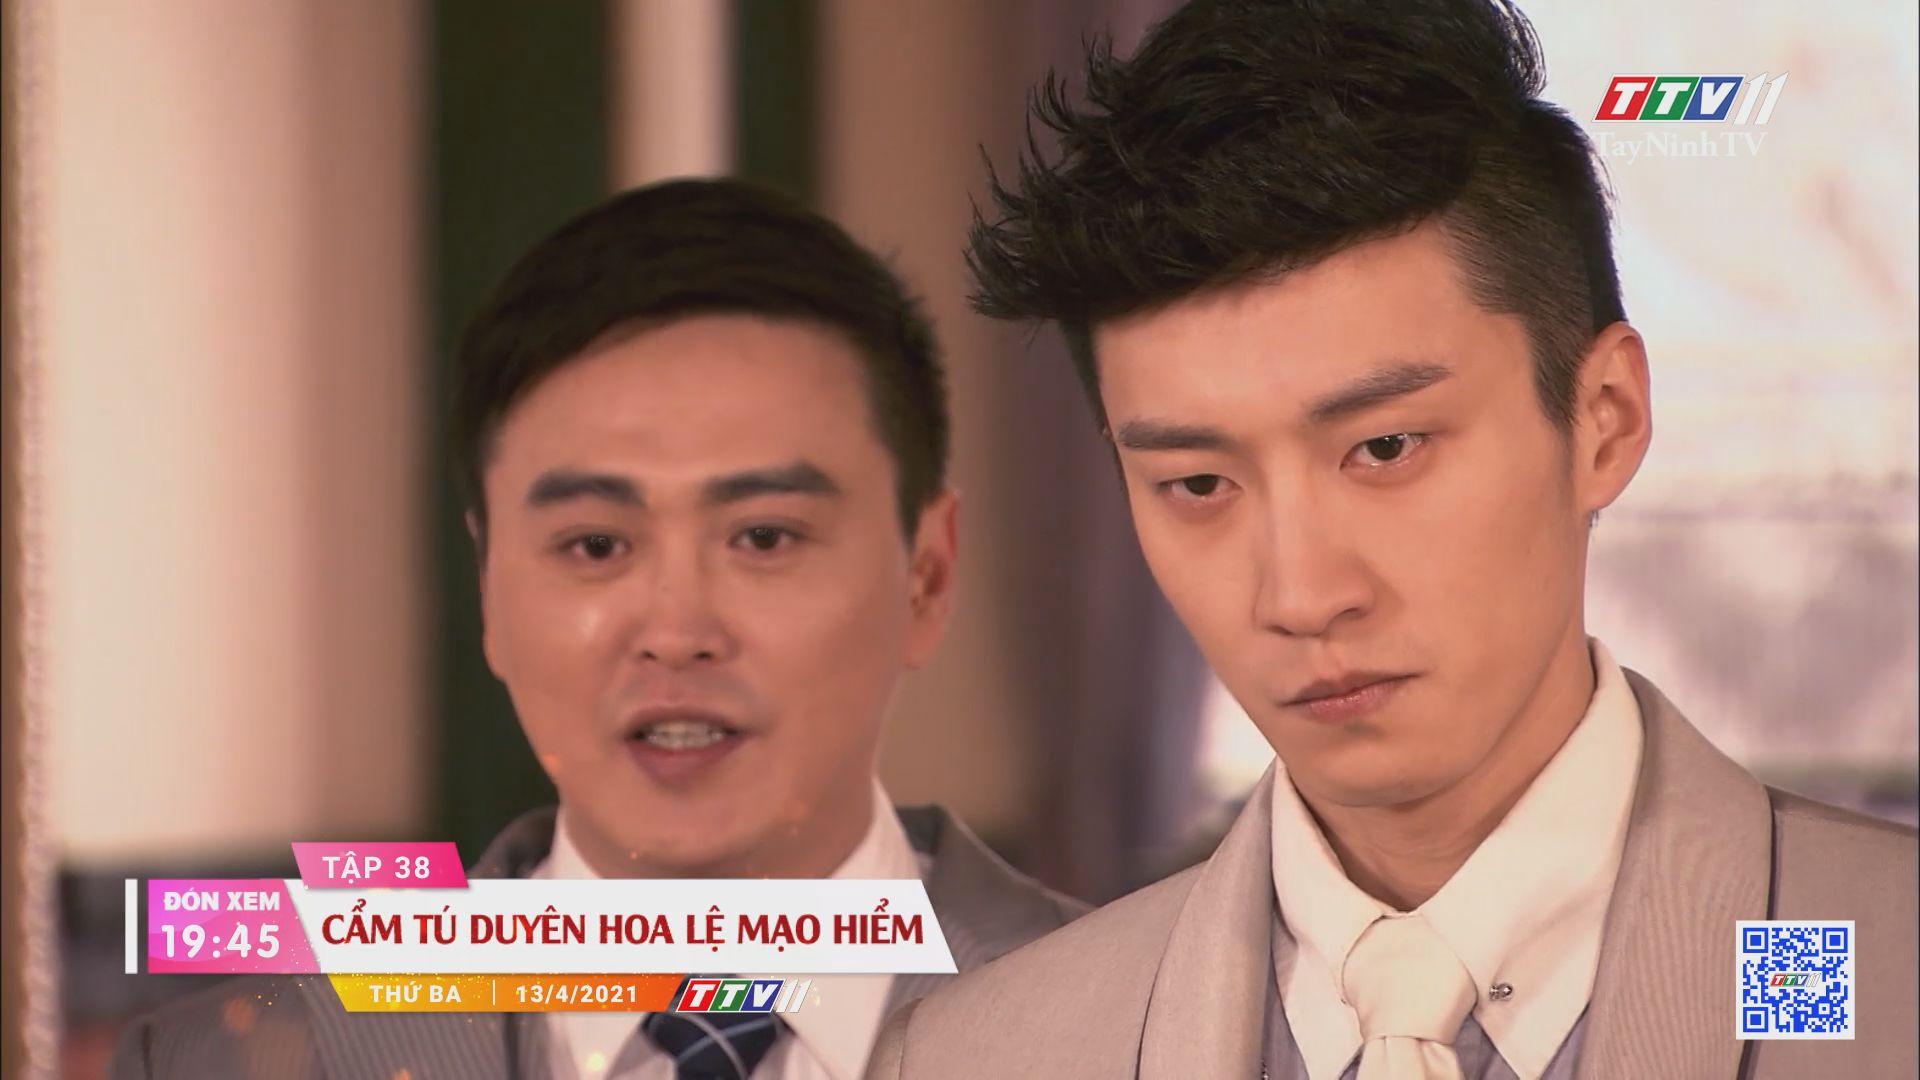 Cẩm Tú duyên hoa lệ mạo hiểm-Trailer tập 38 | PHIM CẨM TÚ DUYÊN HOA LỆ MẠO HIỂM | TayNinhTVE